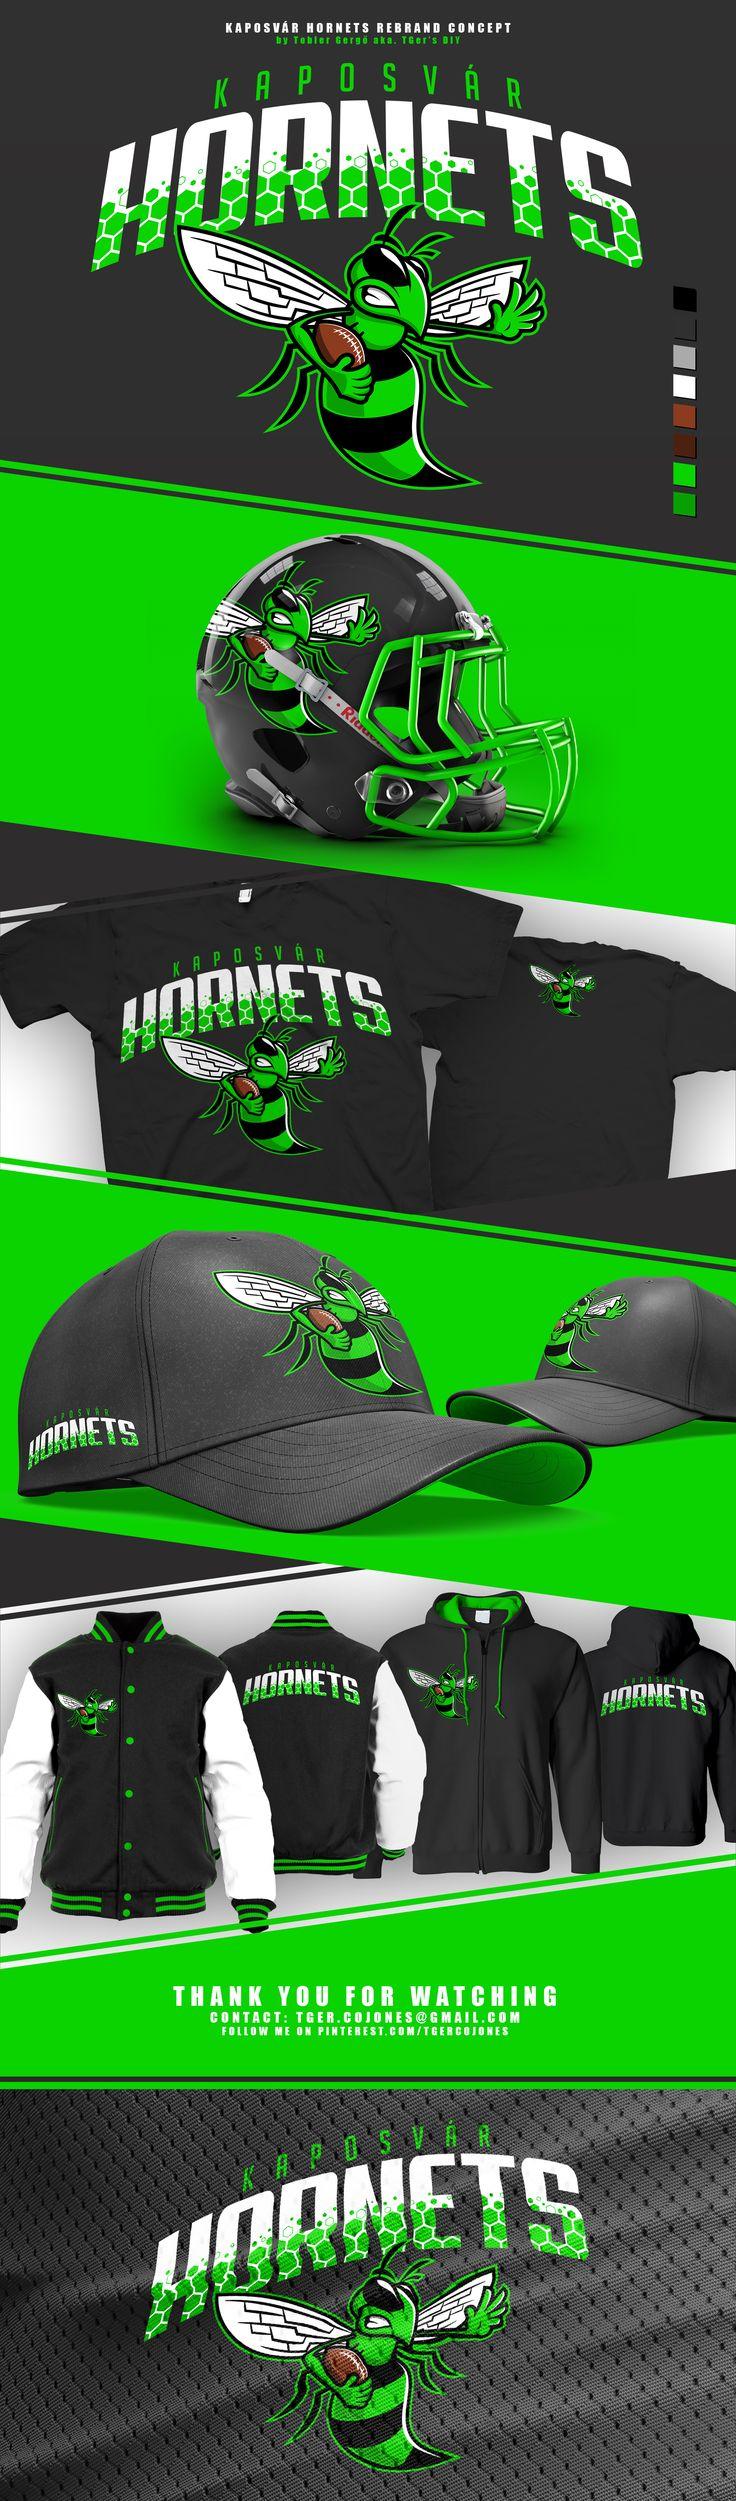 Mascot logo and rebrand concept for the Kaposvár Hornets football team from Hungary. Made by Tobler Gergő aka TGer's DIY Follow me at Pinterest.com/tgercojones Learn more: https://www.facebook.com/KaposvarHornets/